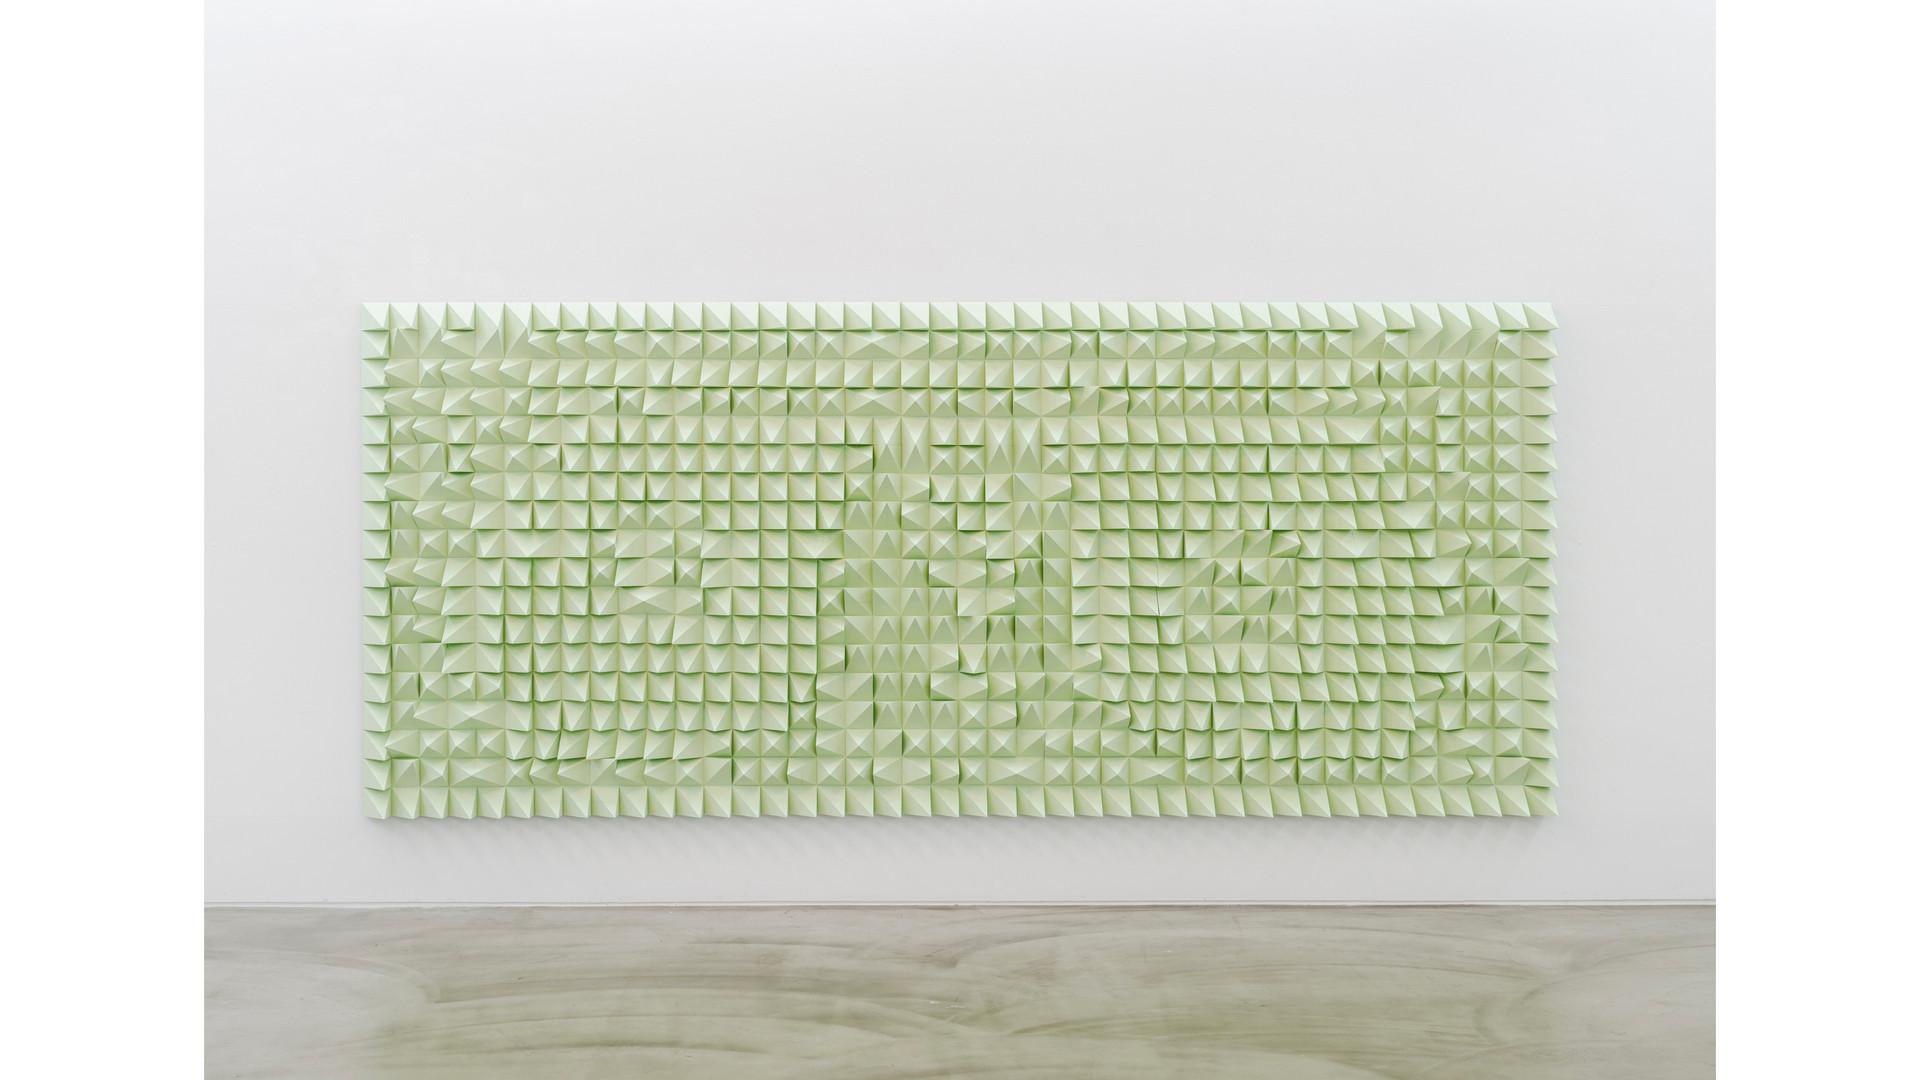 Silent Washington, 2021, EVA foam, 420 x 180 x 10cm